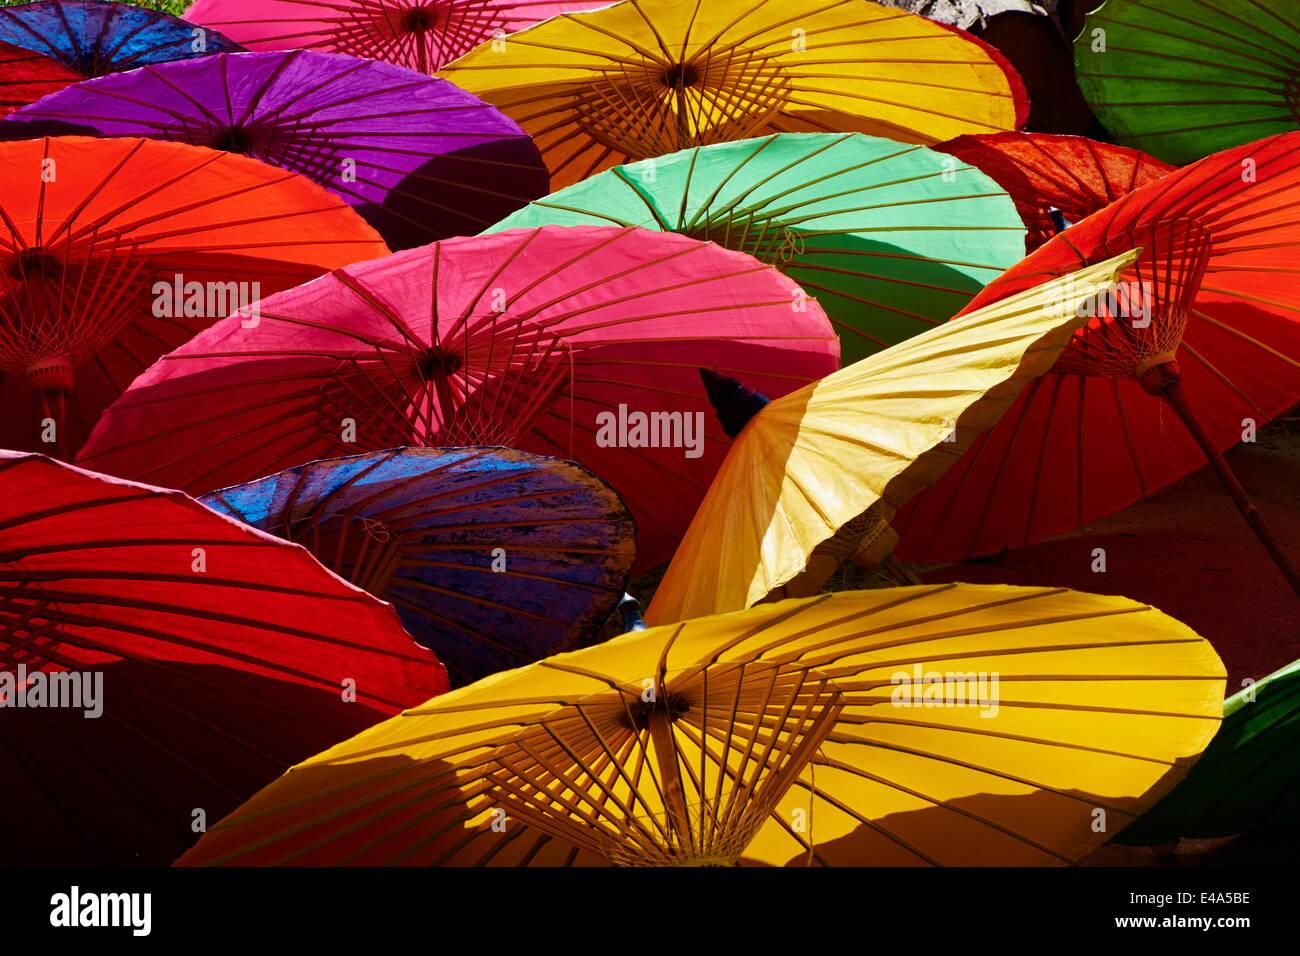 Umbrellas at Borsang Handicraft Village, Chiang Mai, Thailand, Southeast Asia, Asia - Stock Image